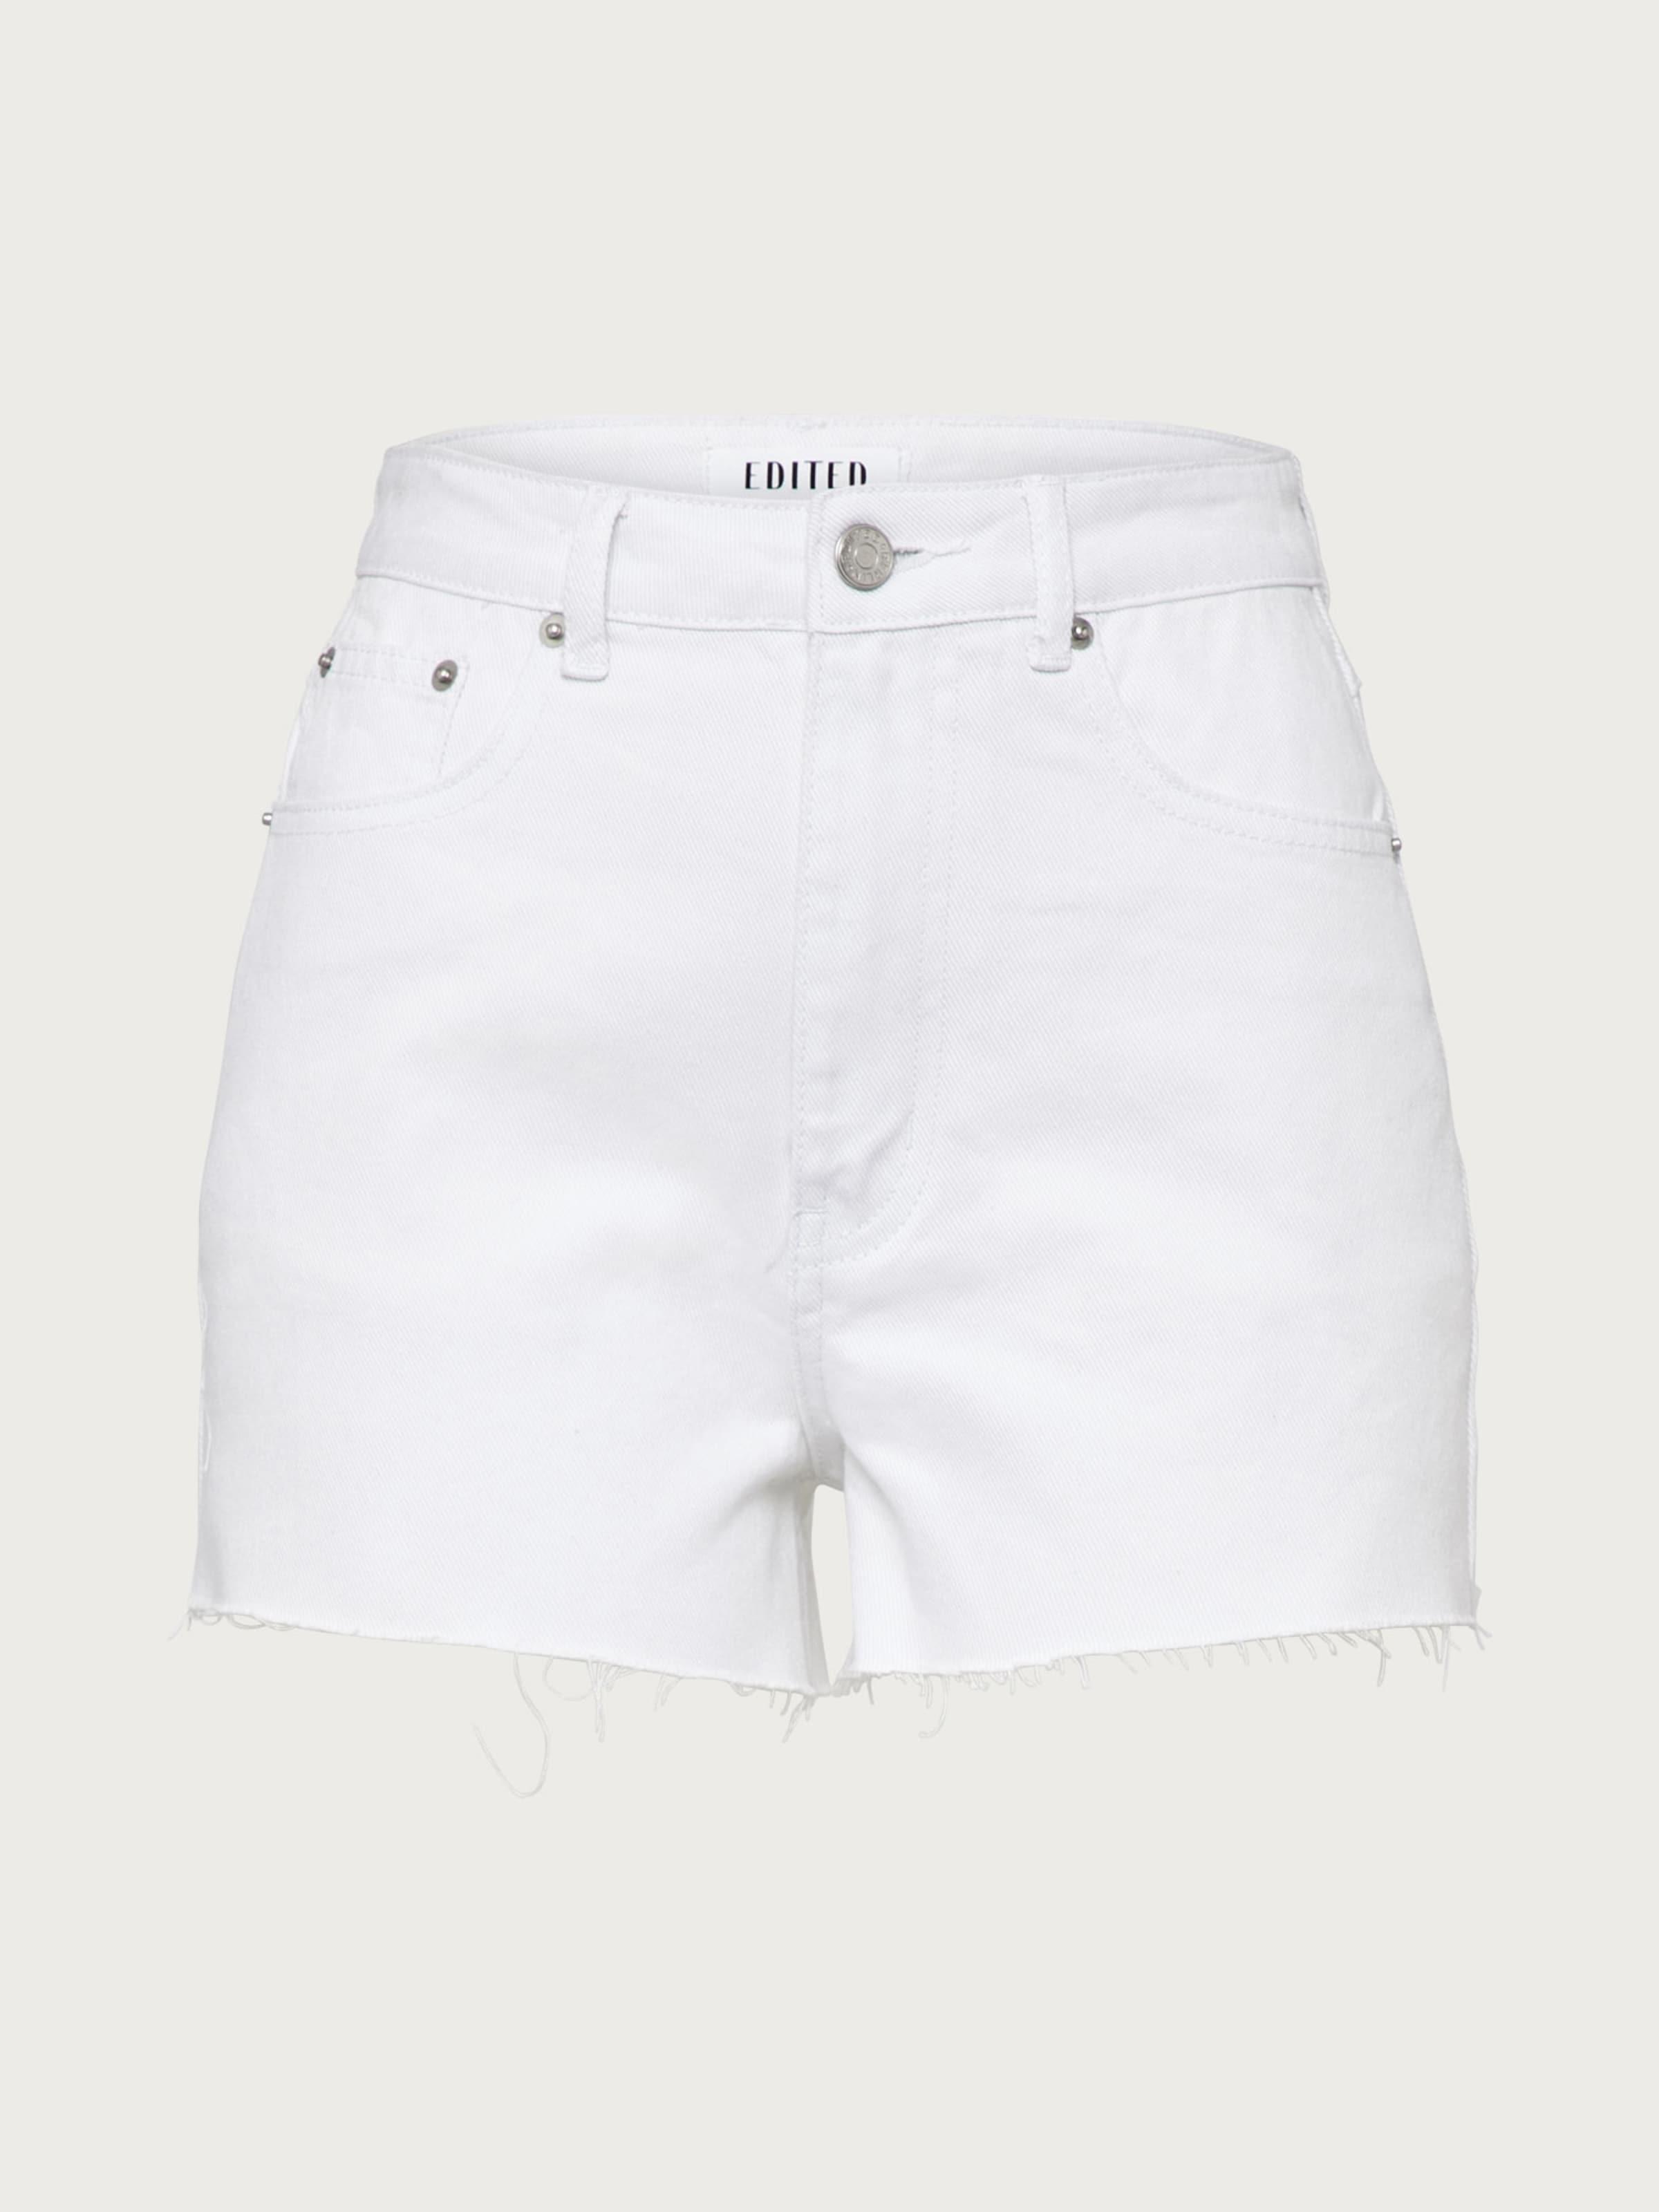 Edited In Shorts White Denim 'selia' f6yYb7g